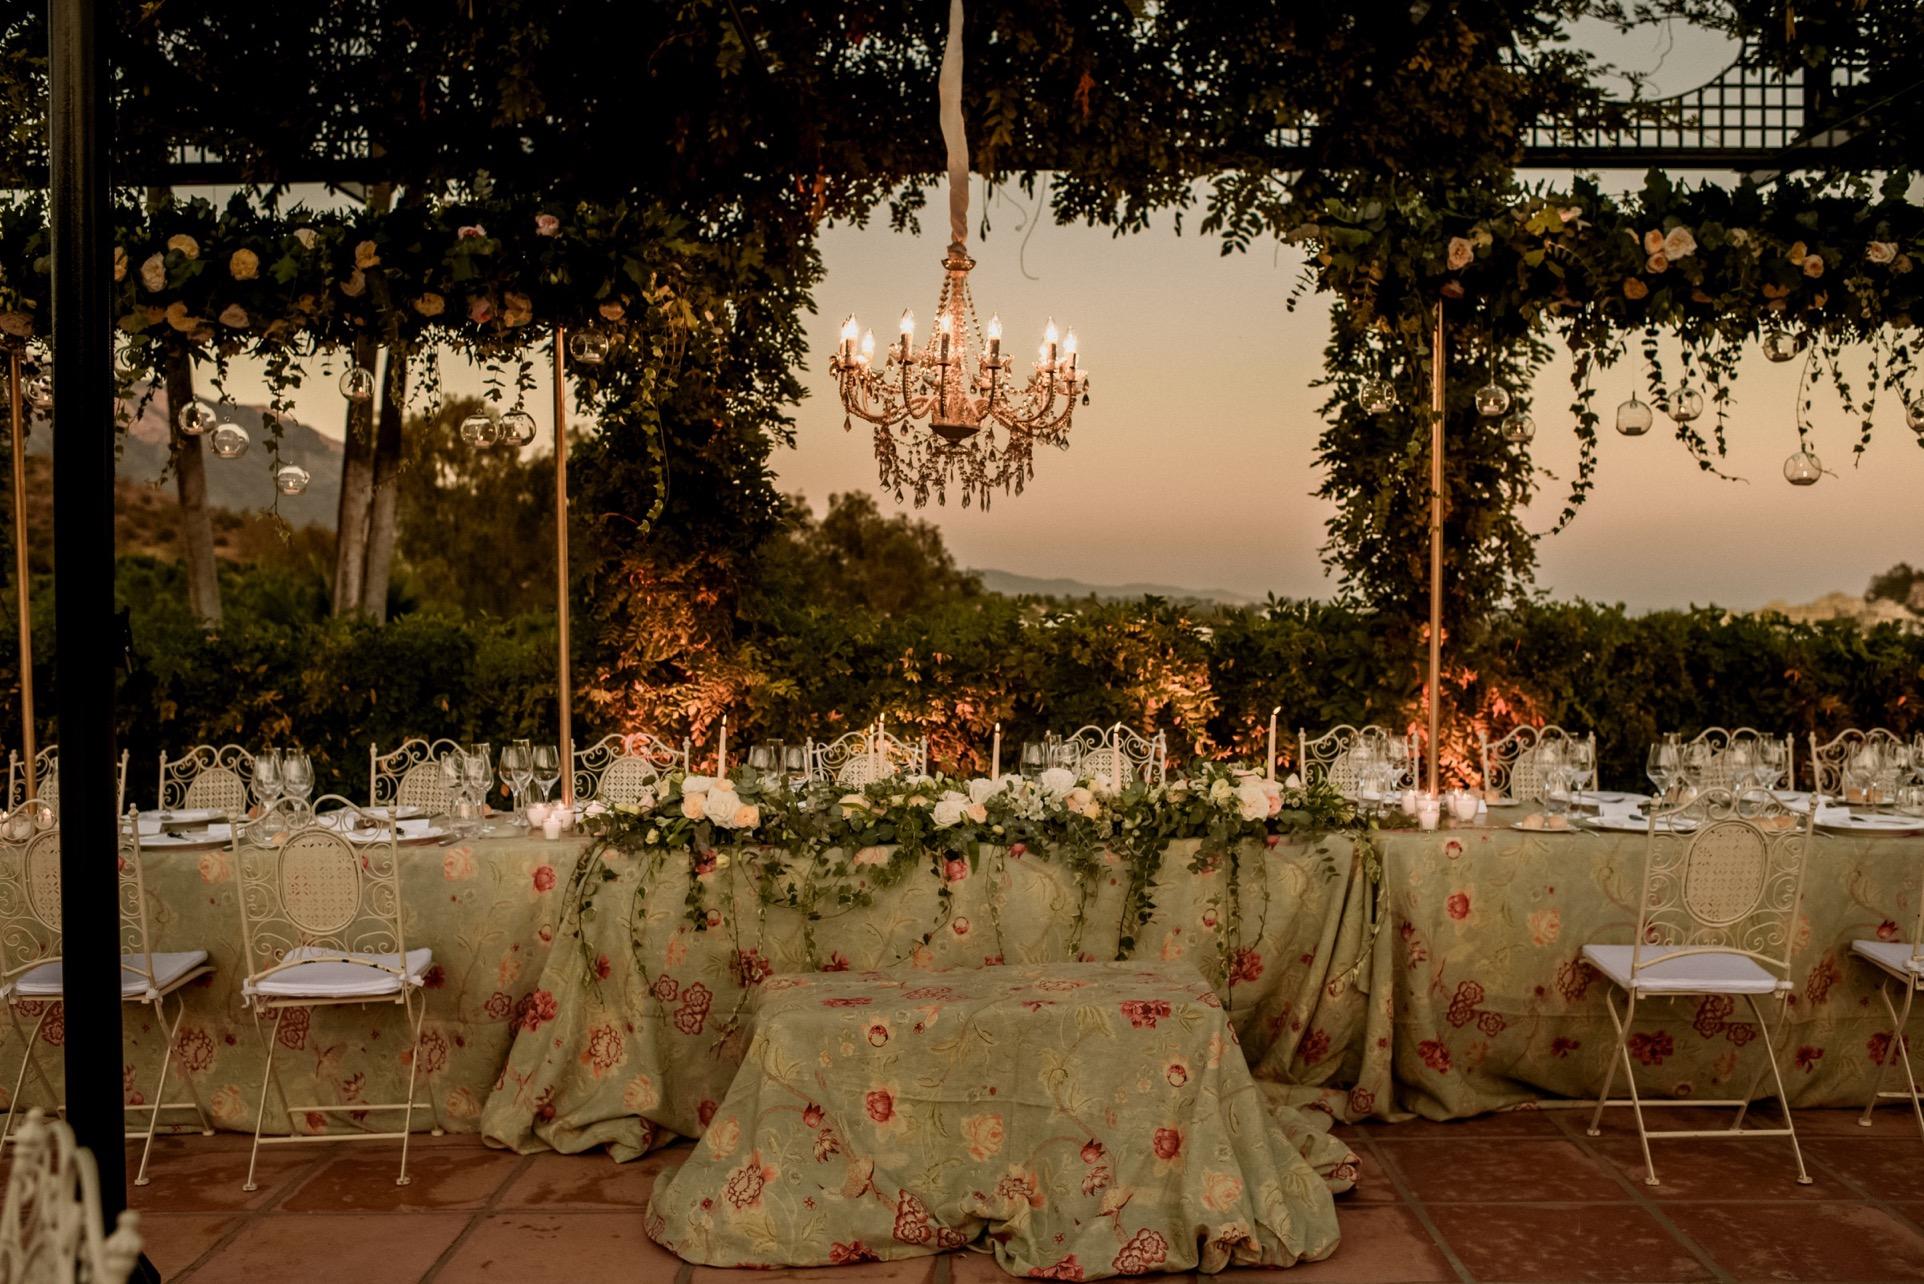 Si-Quiero-Wedding-Planner-By-Sira-Antequera-Bodas-Málaga-Marbella-Miami-15